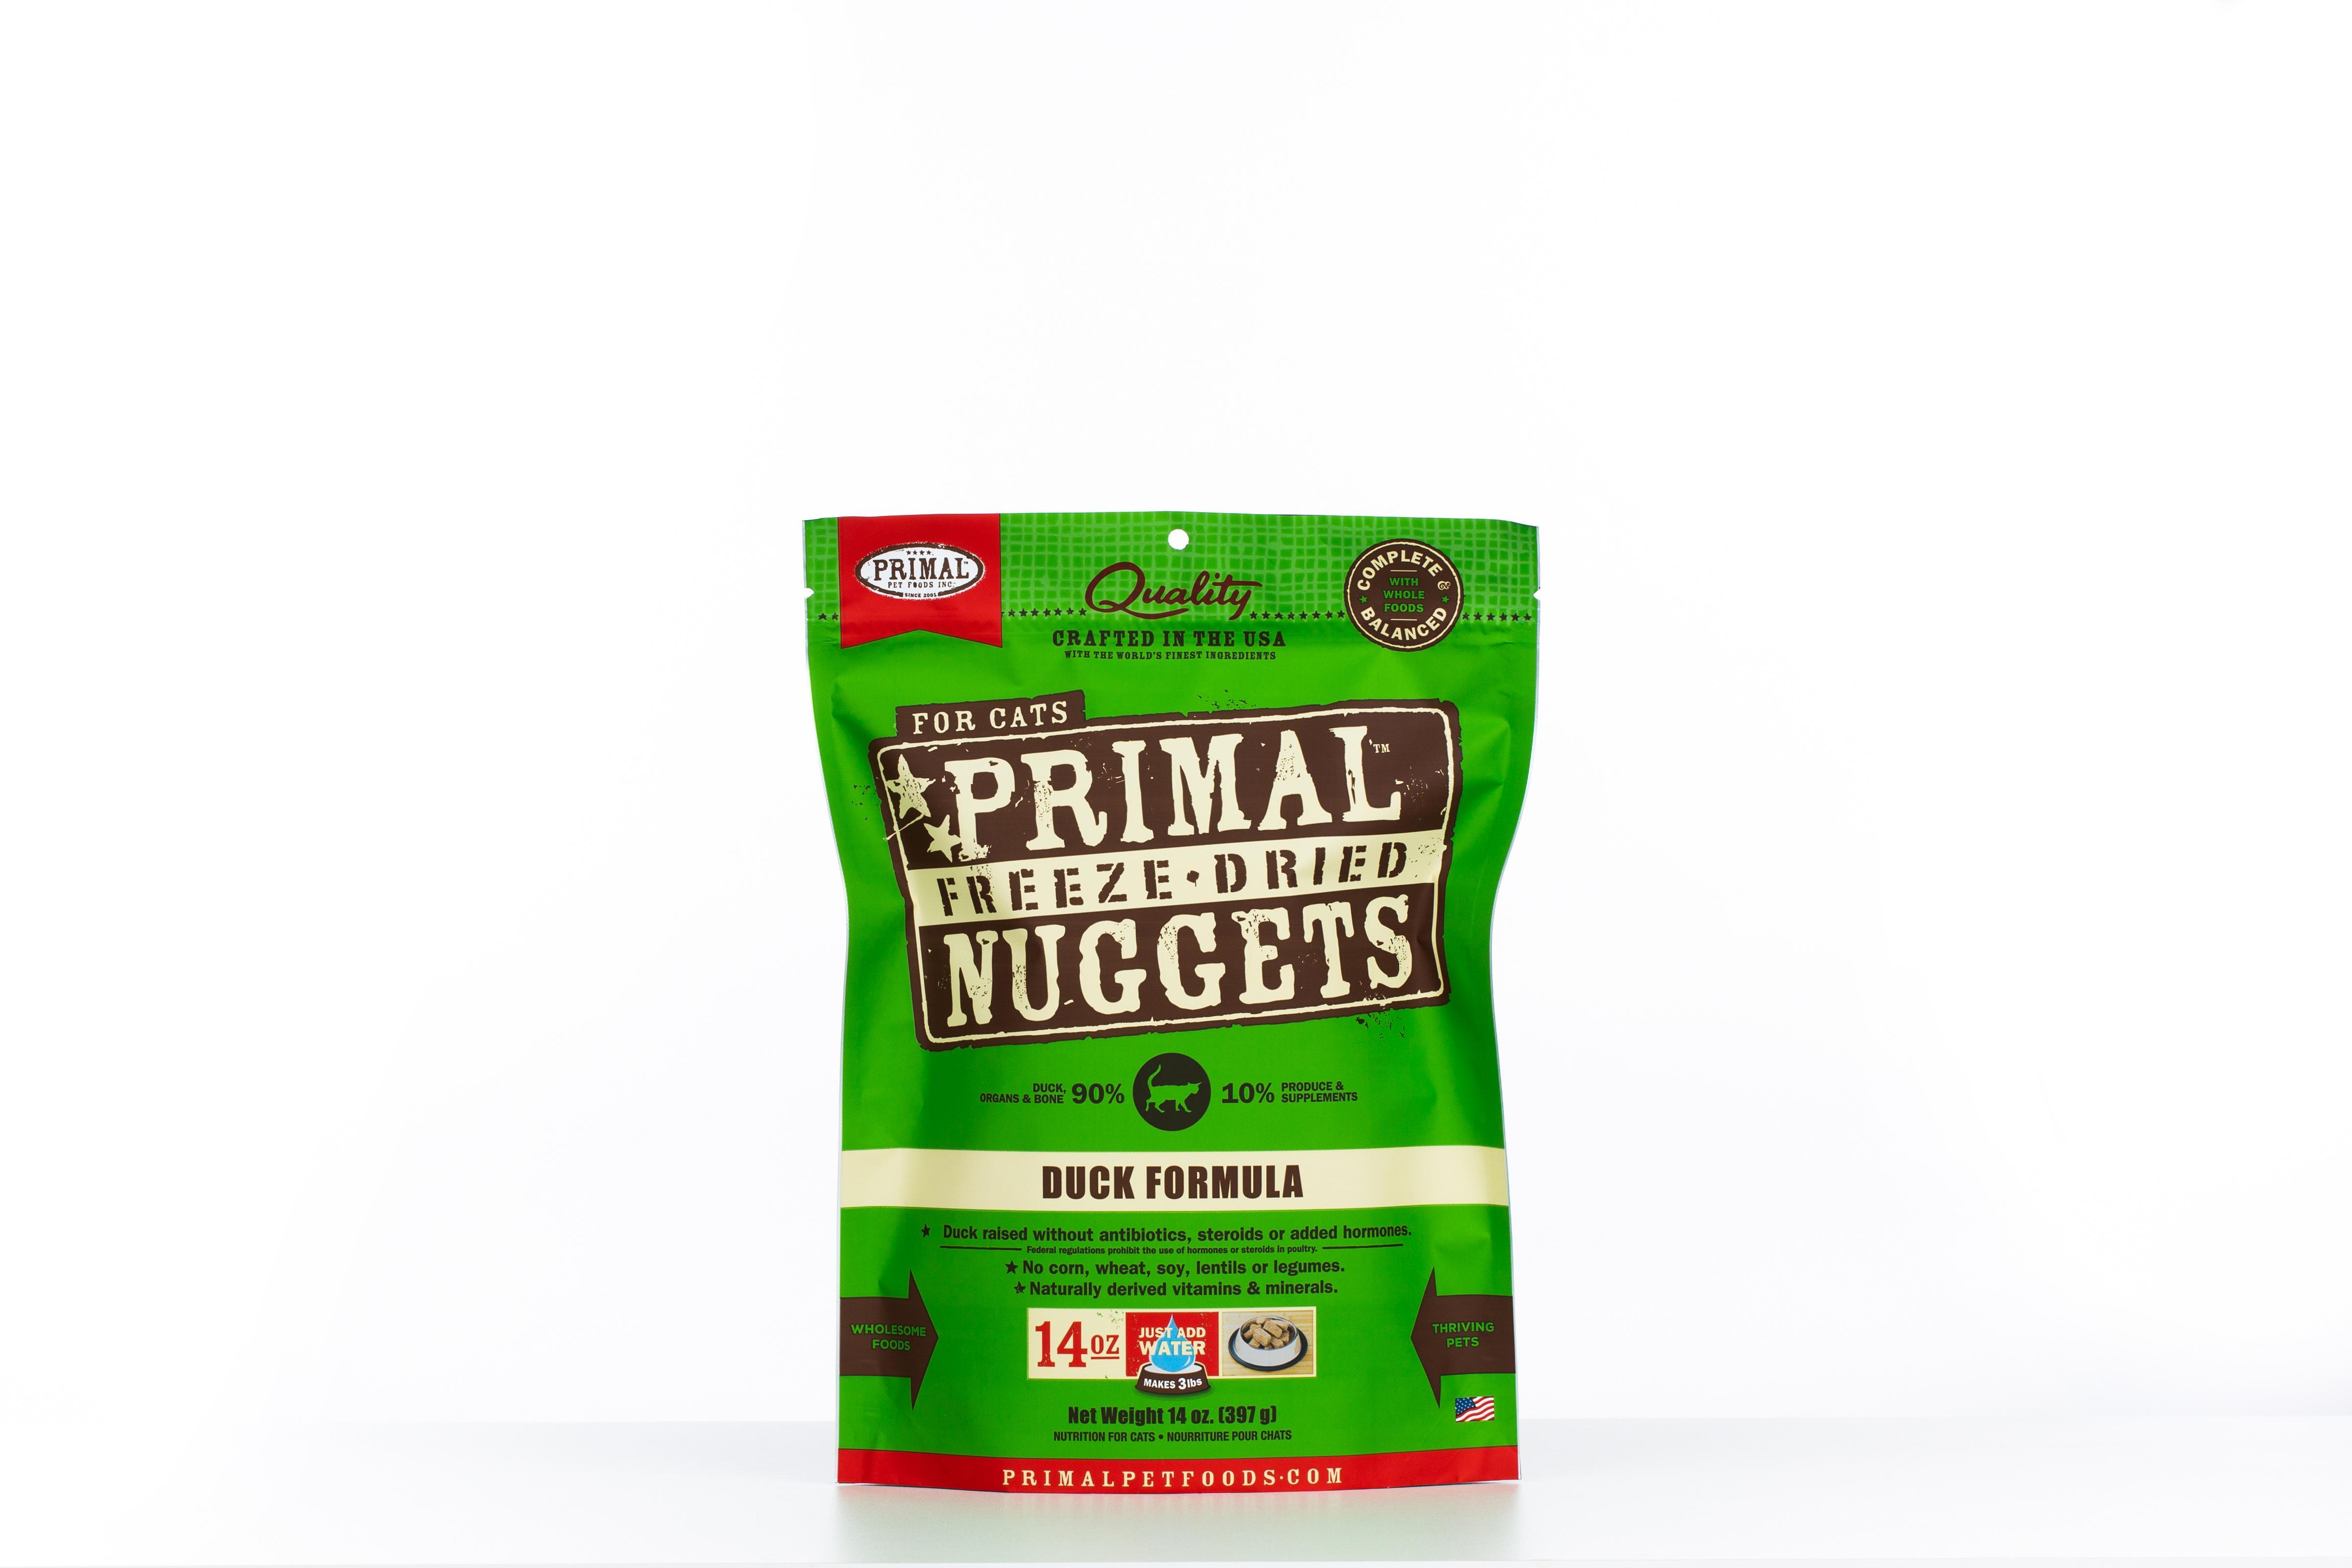 Primal Duck Formula Nuggets Grain-Free Raw Freeze-Dried Cat Food, 14-oz bag